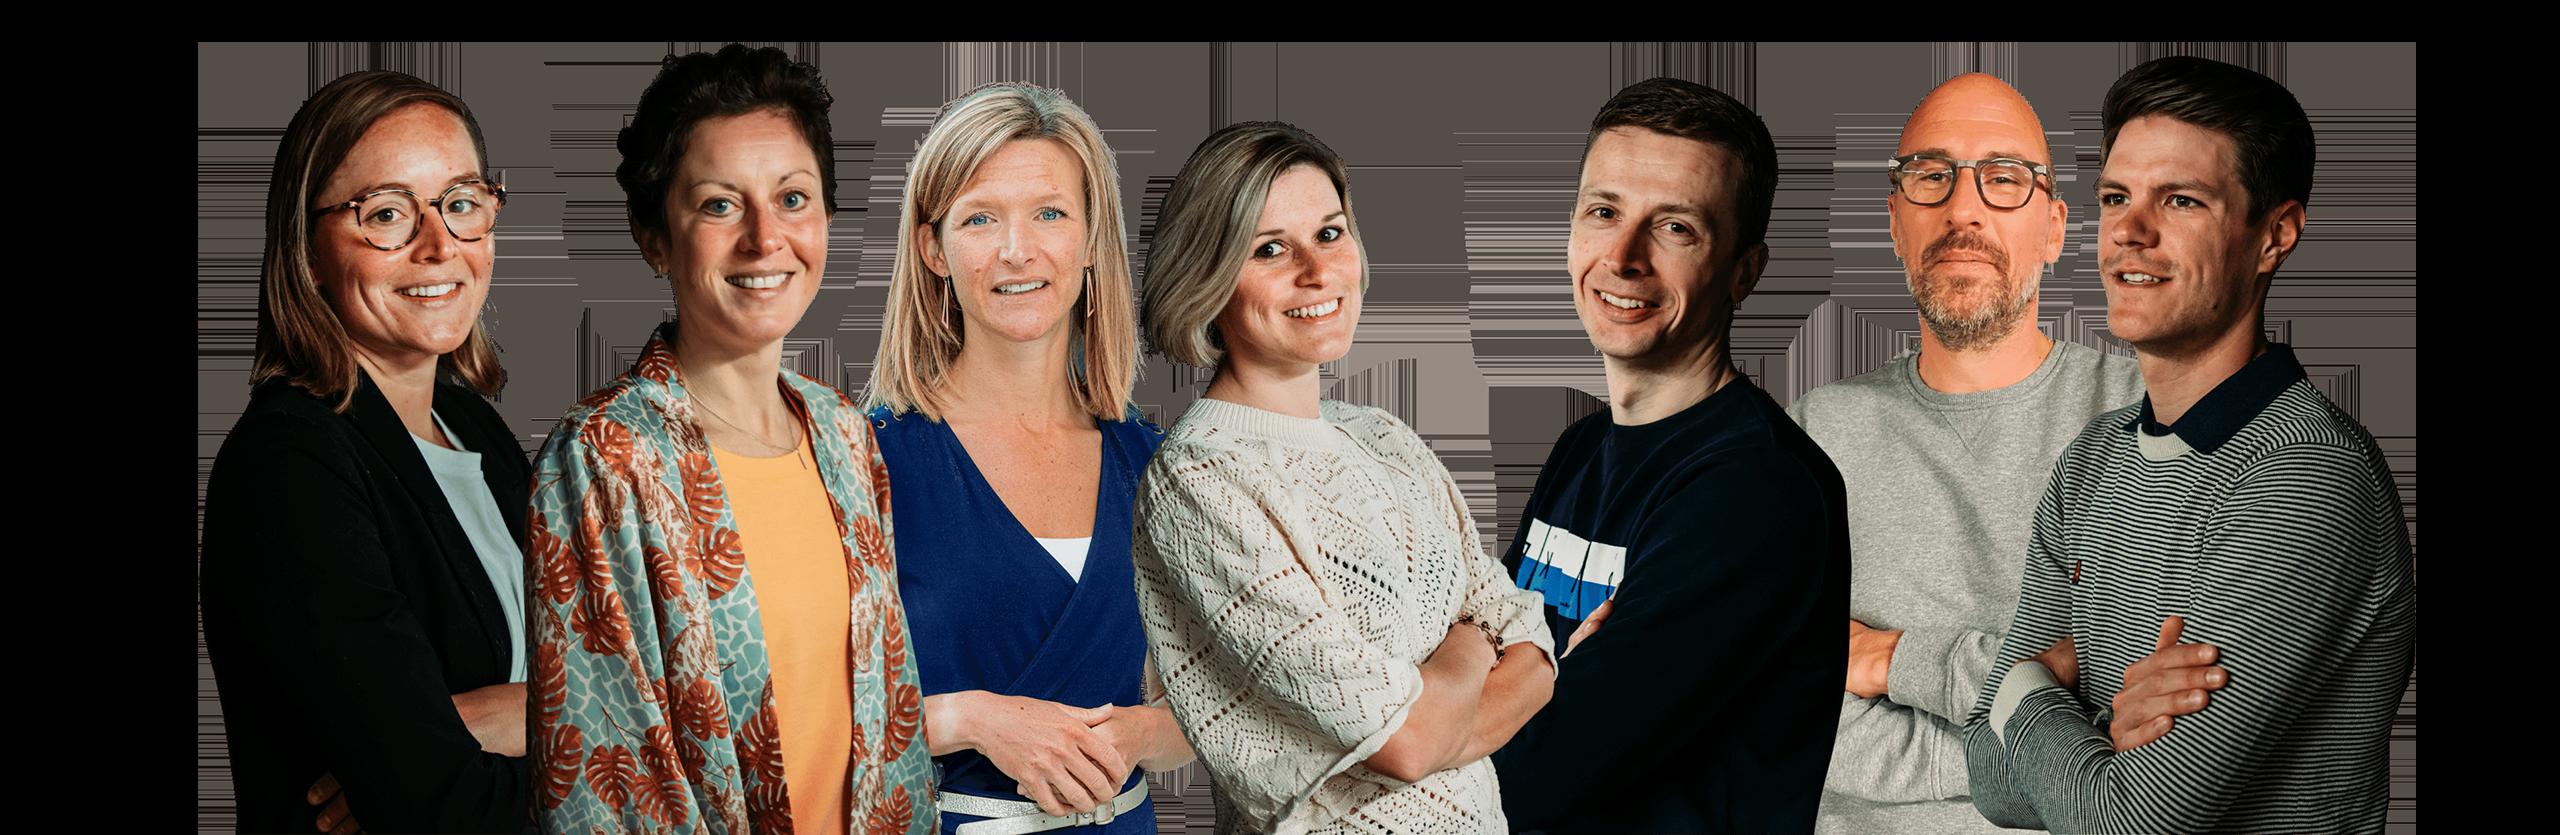 Groepsfoto team van experten